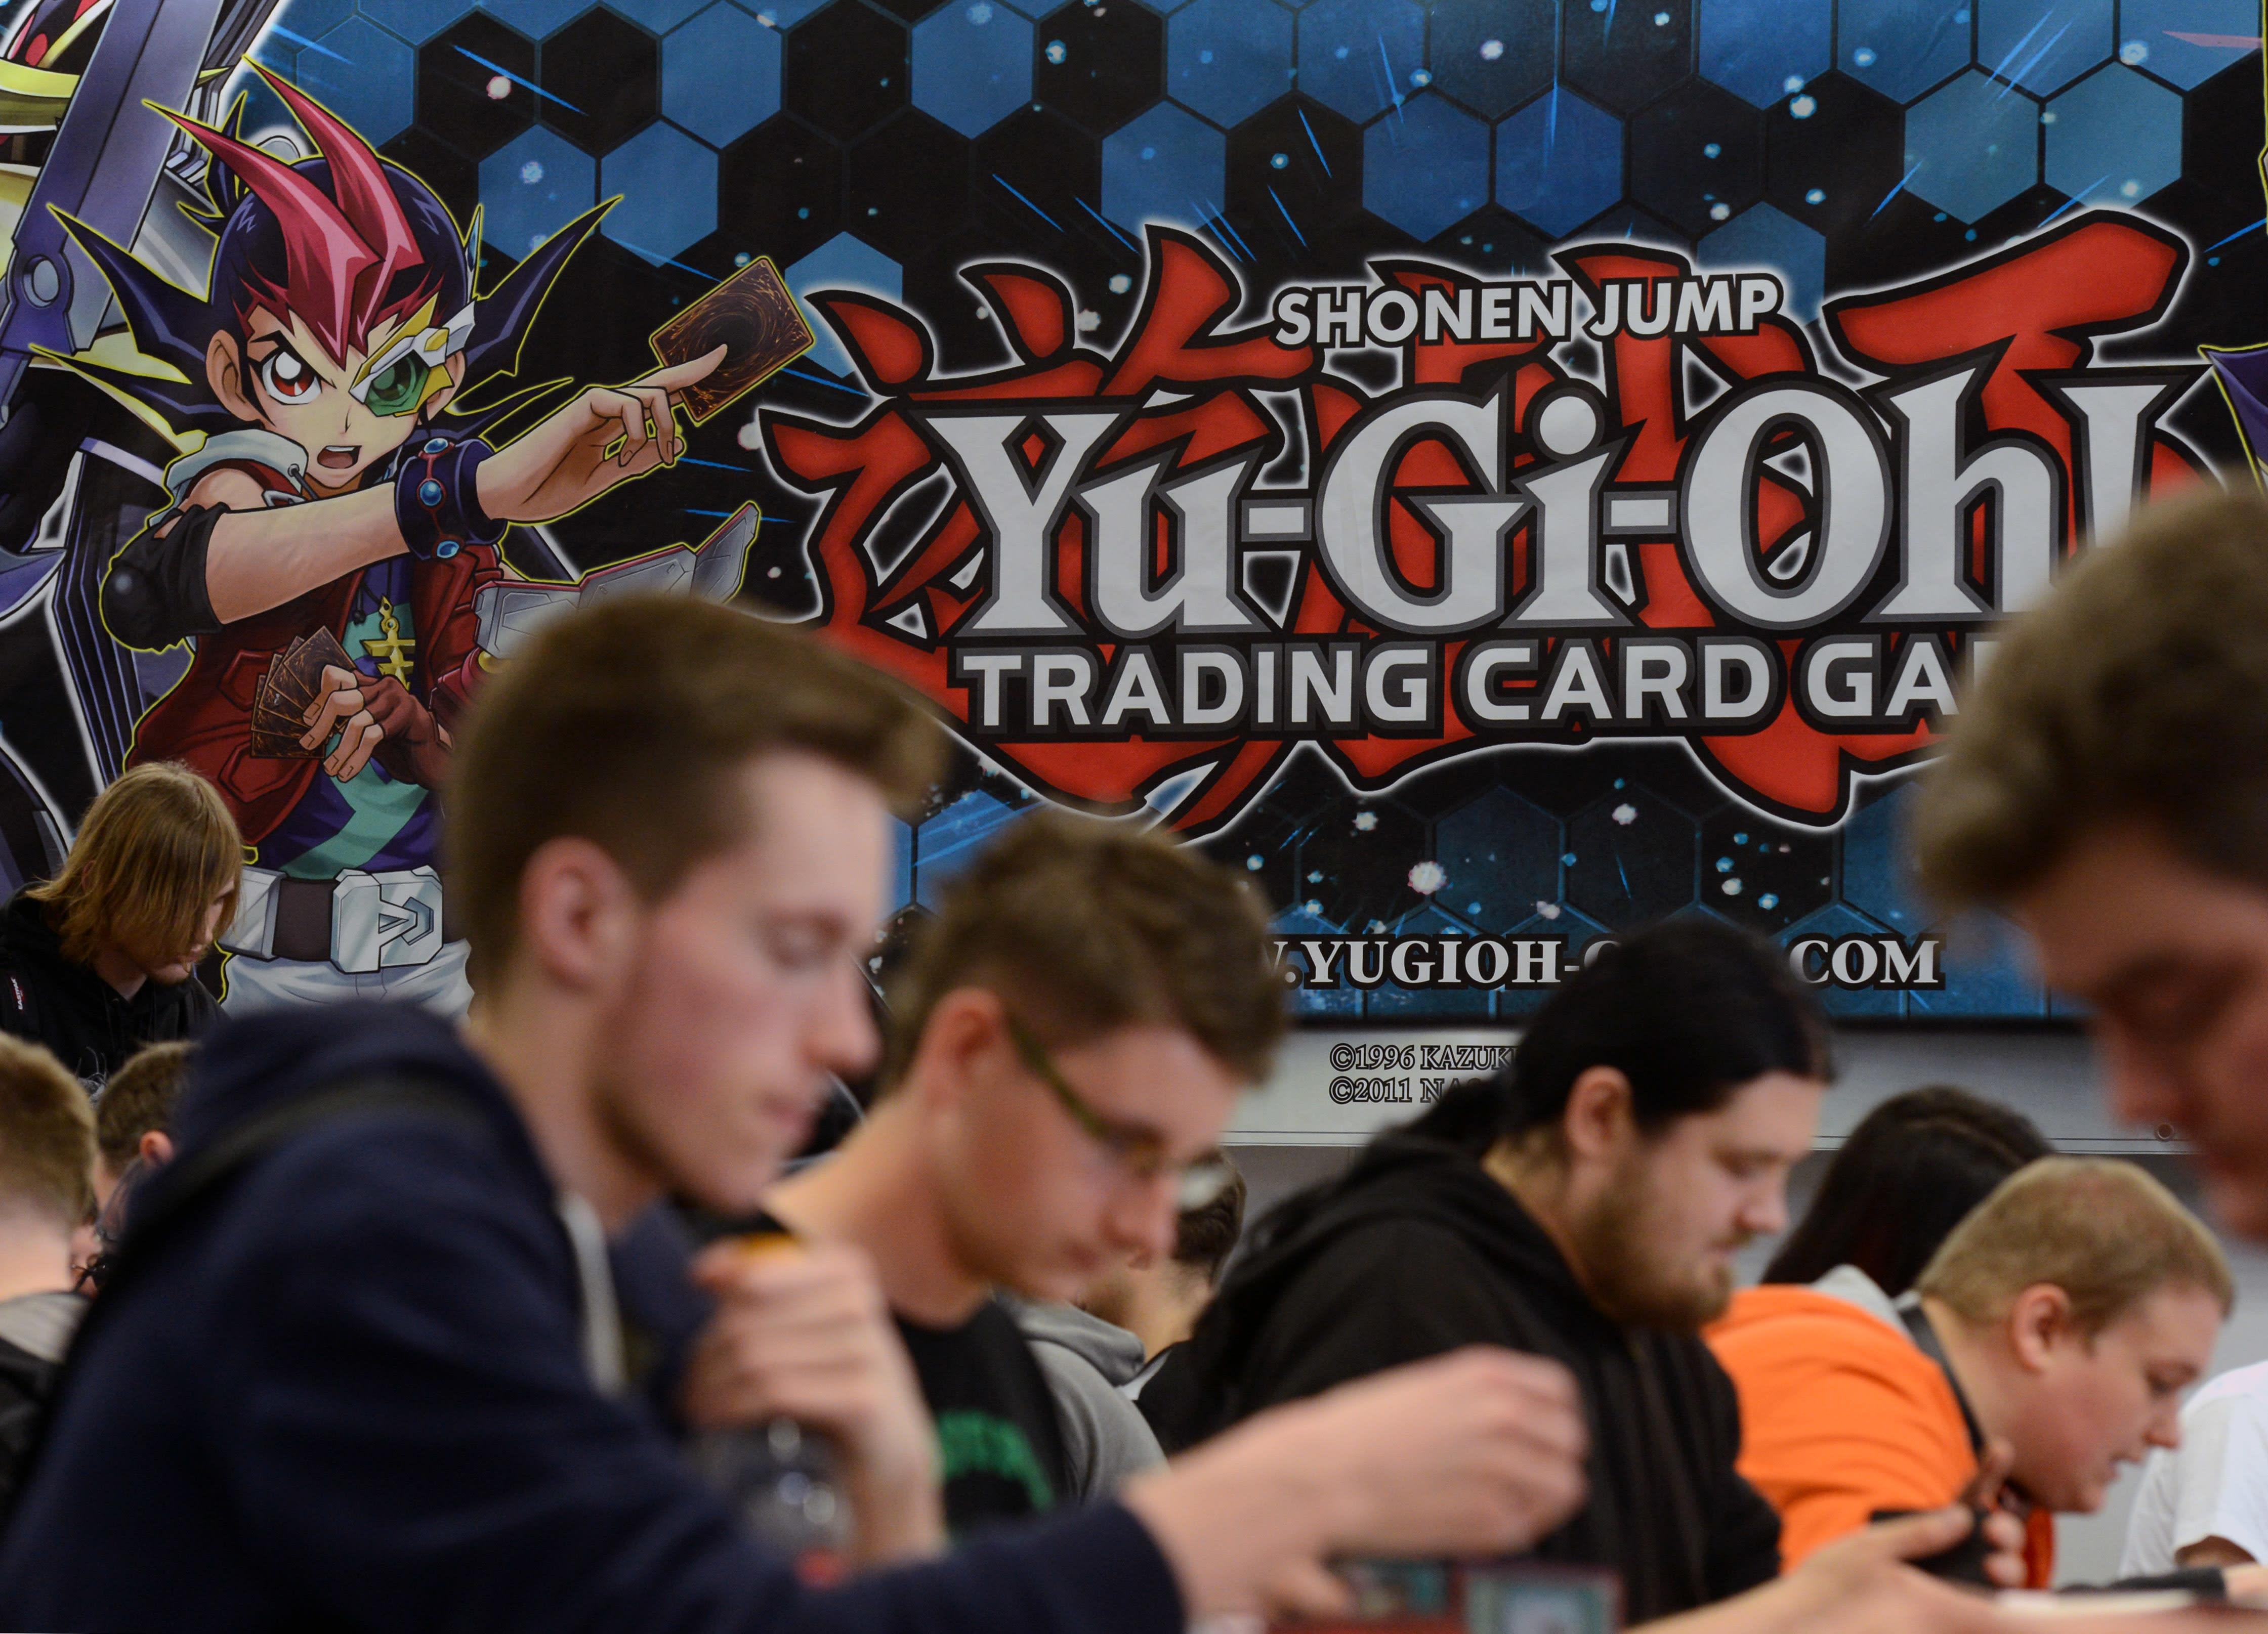 Yu-Gi-Oh event